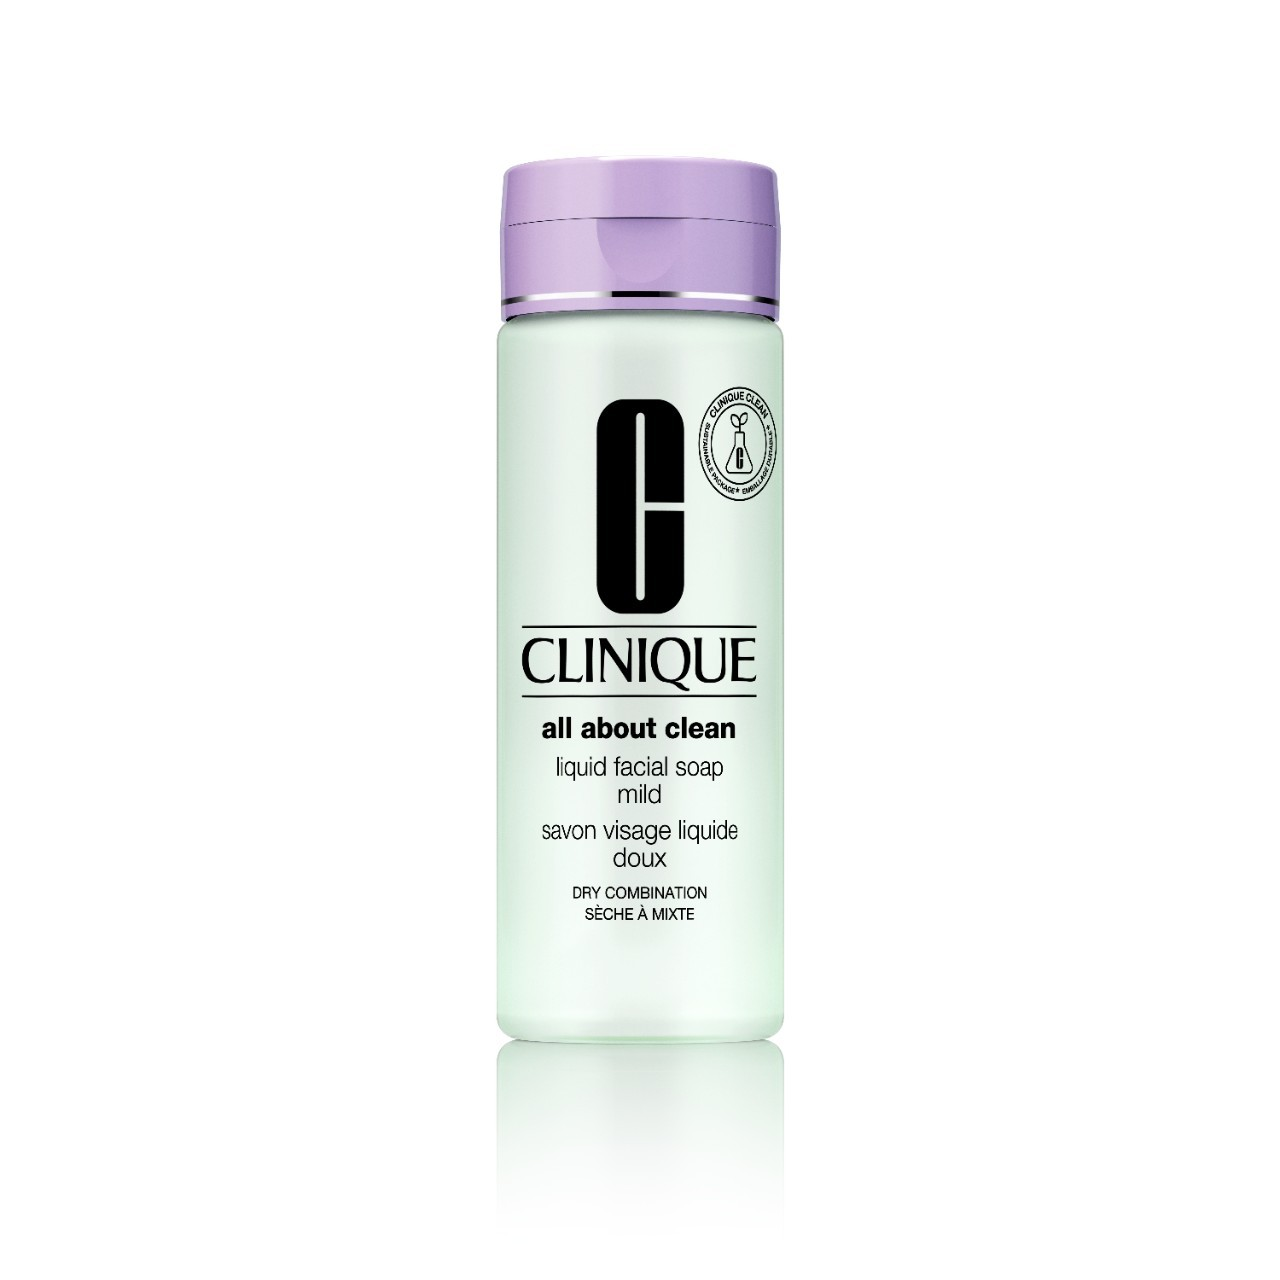 Clinique - All About Clean™ Liquid Facial Soap Mild -